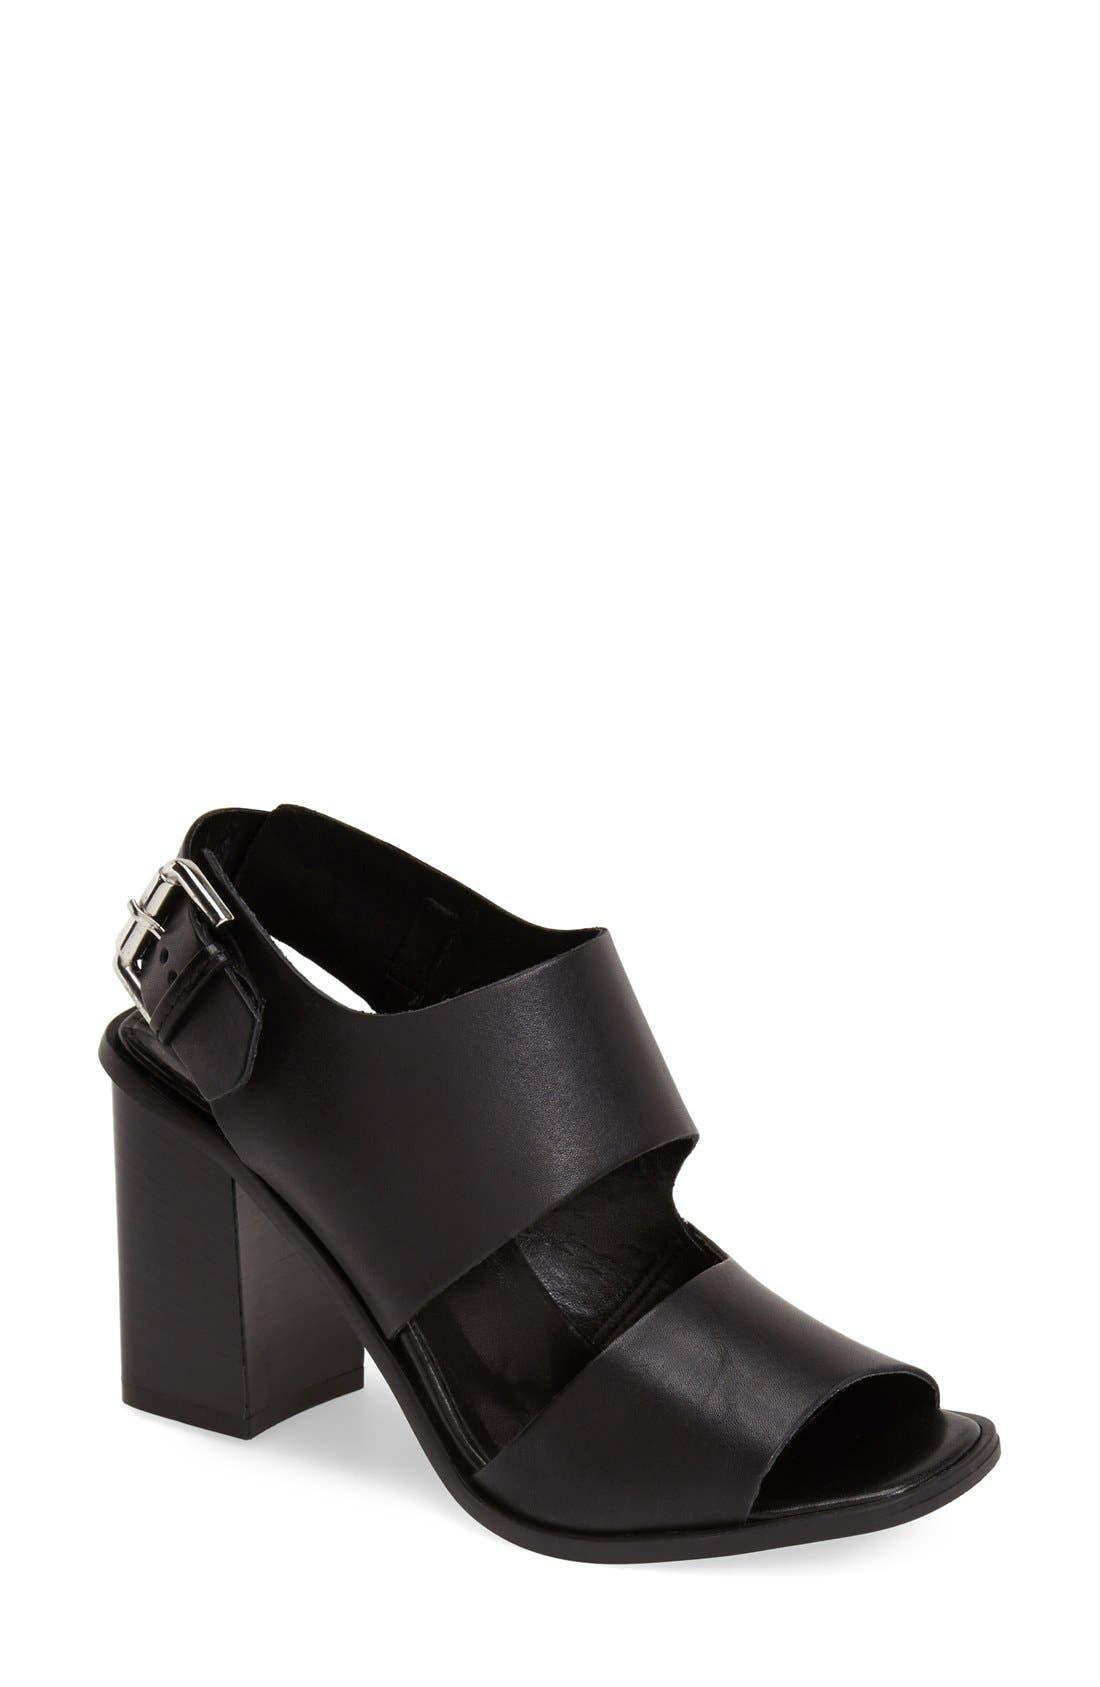 Alternate Image 1 Selected - Topshop 'React' Block Heel Sandal (Women)